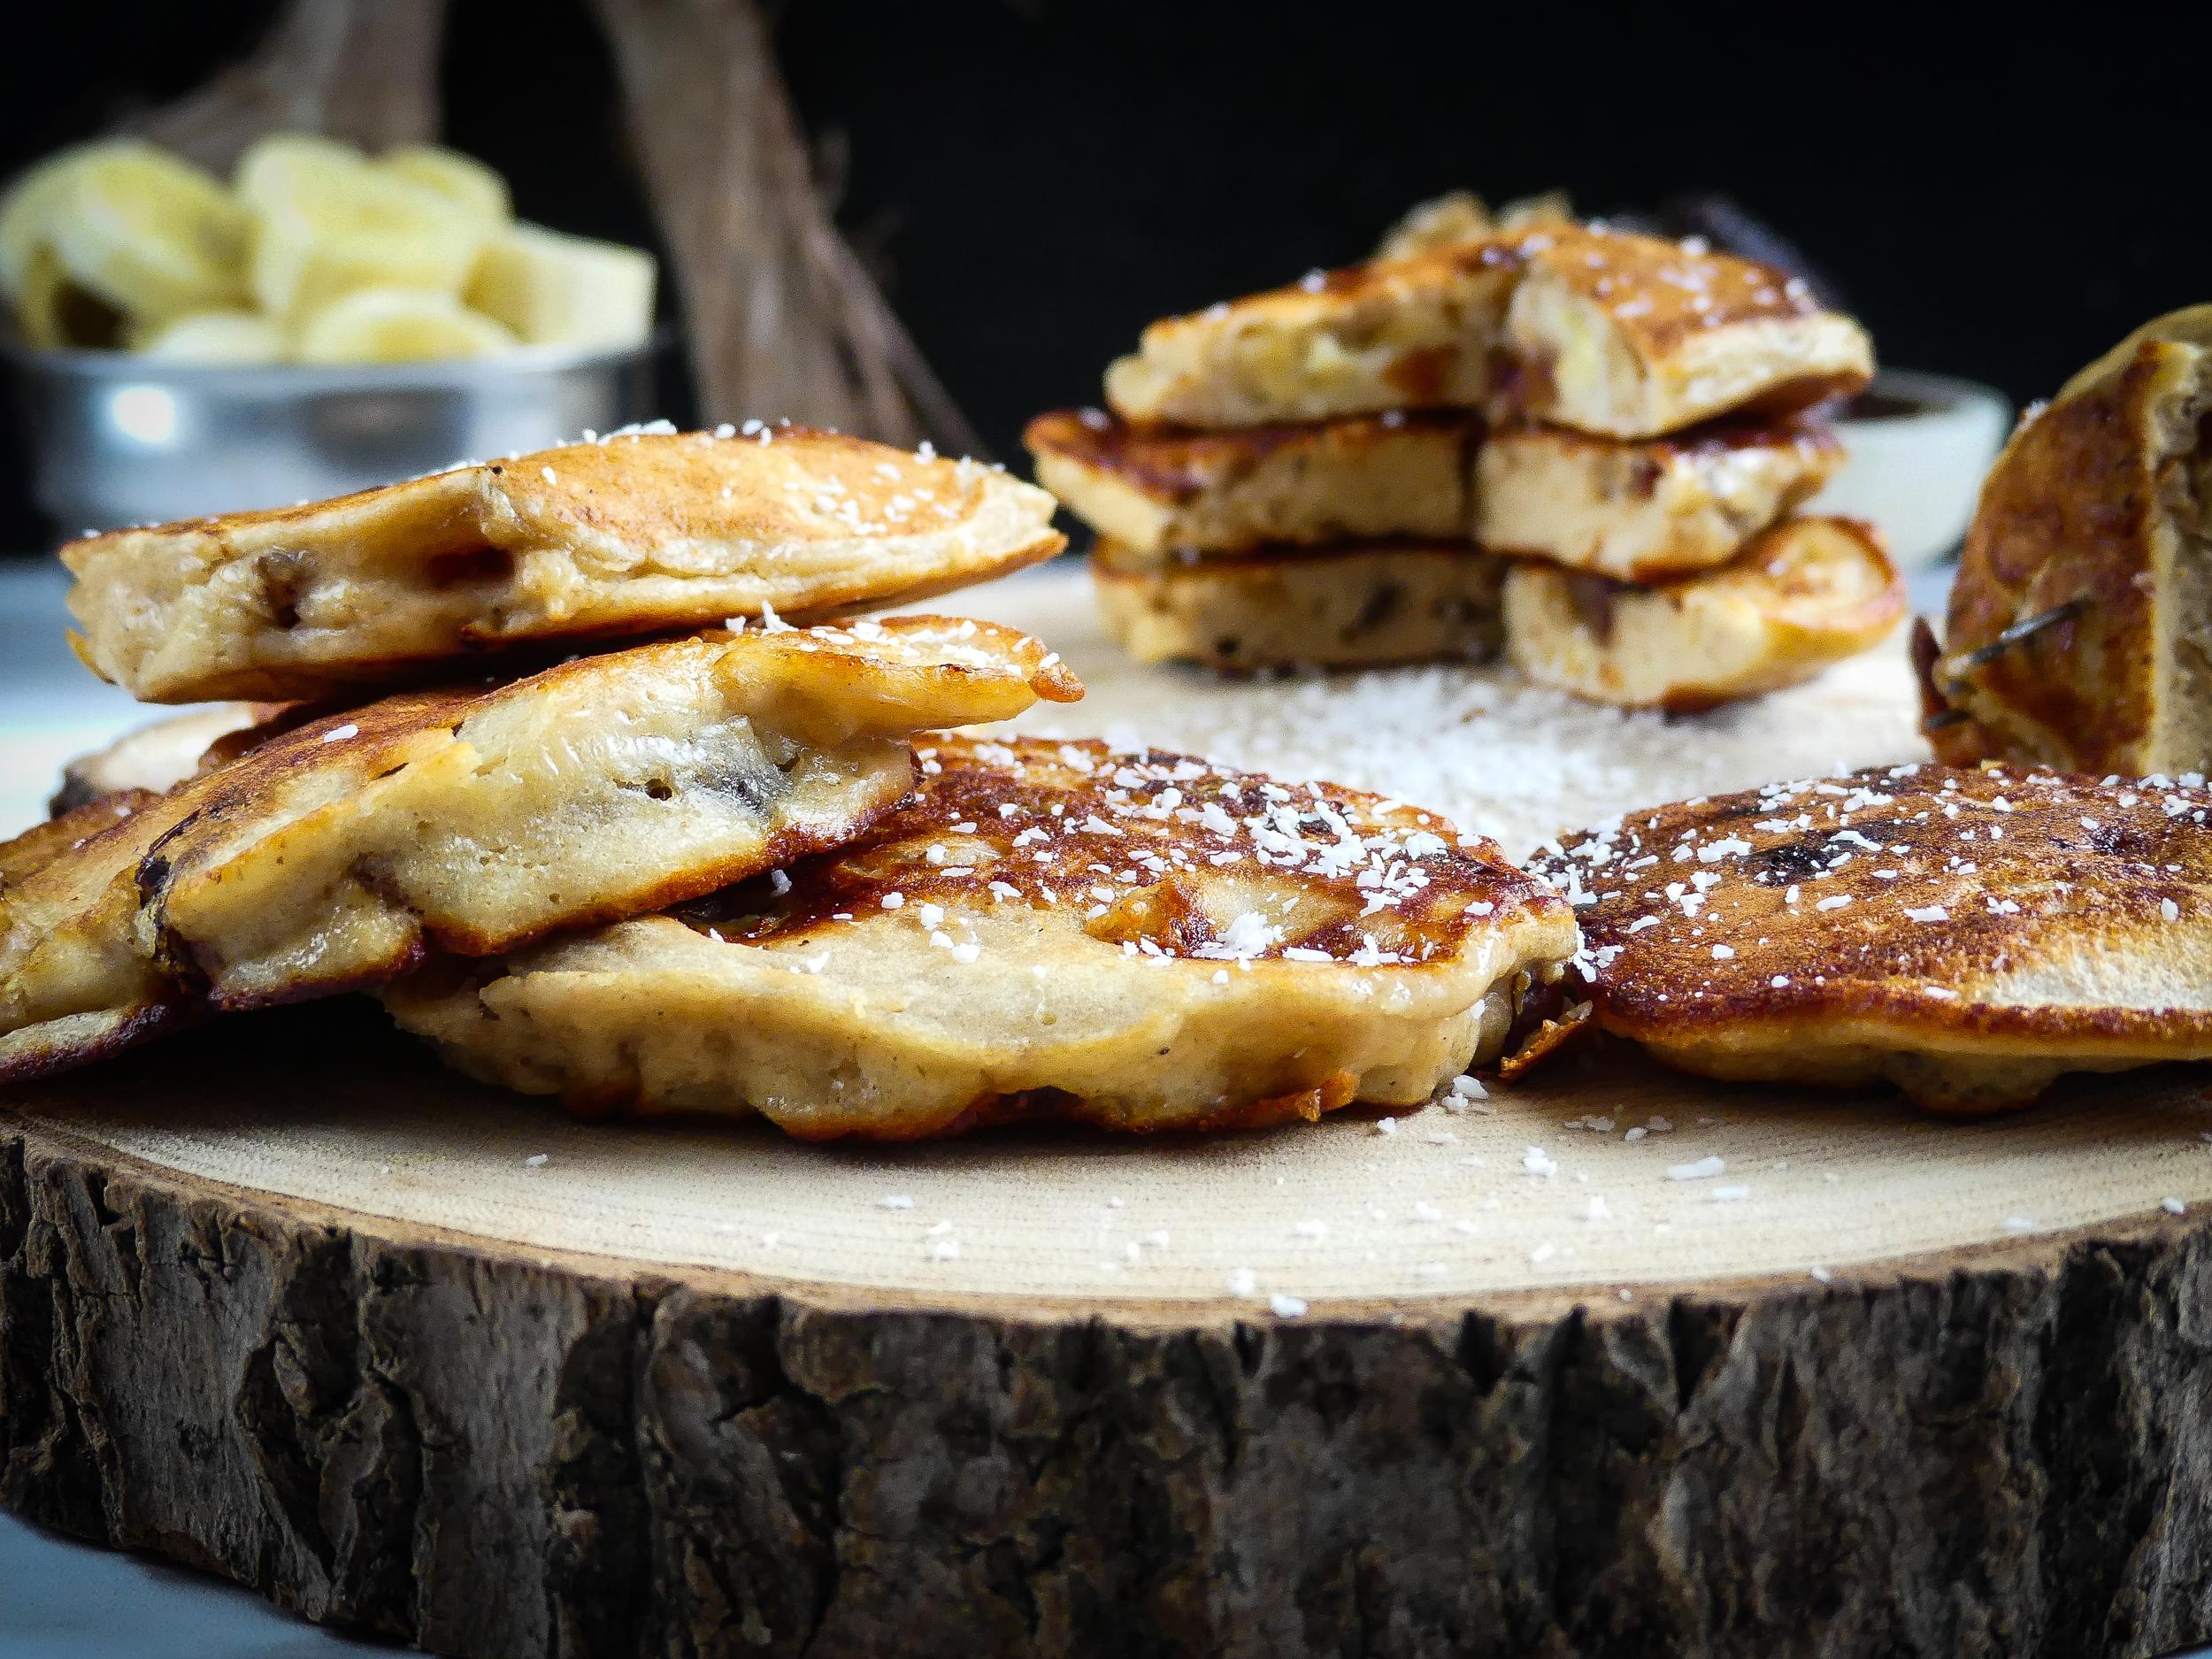 Banana, dates & walnut pancakes2